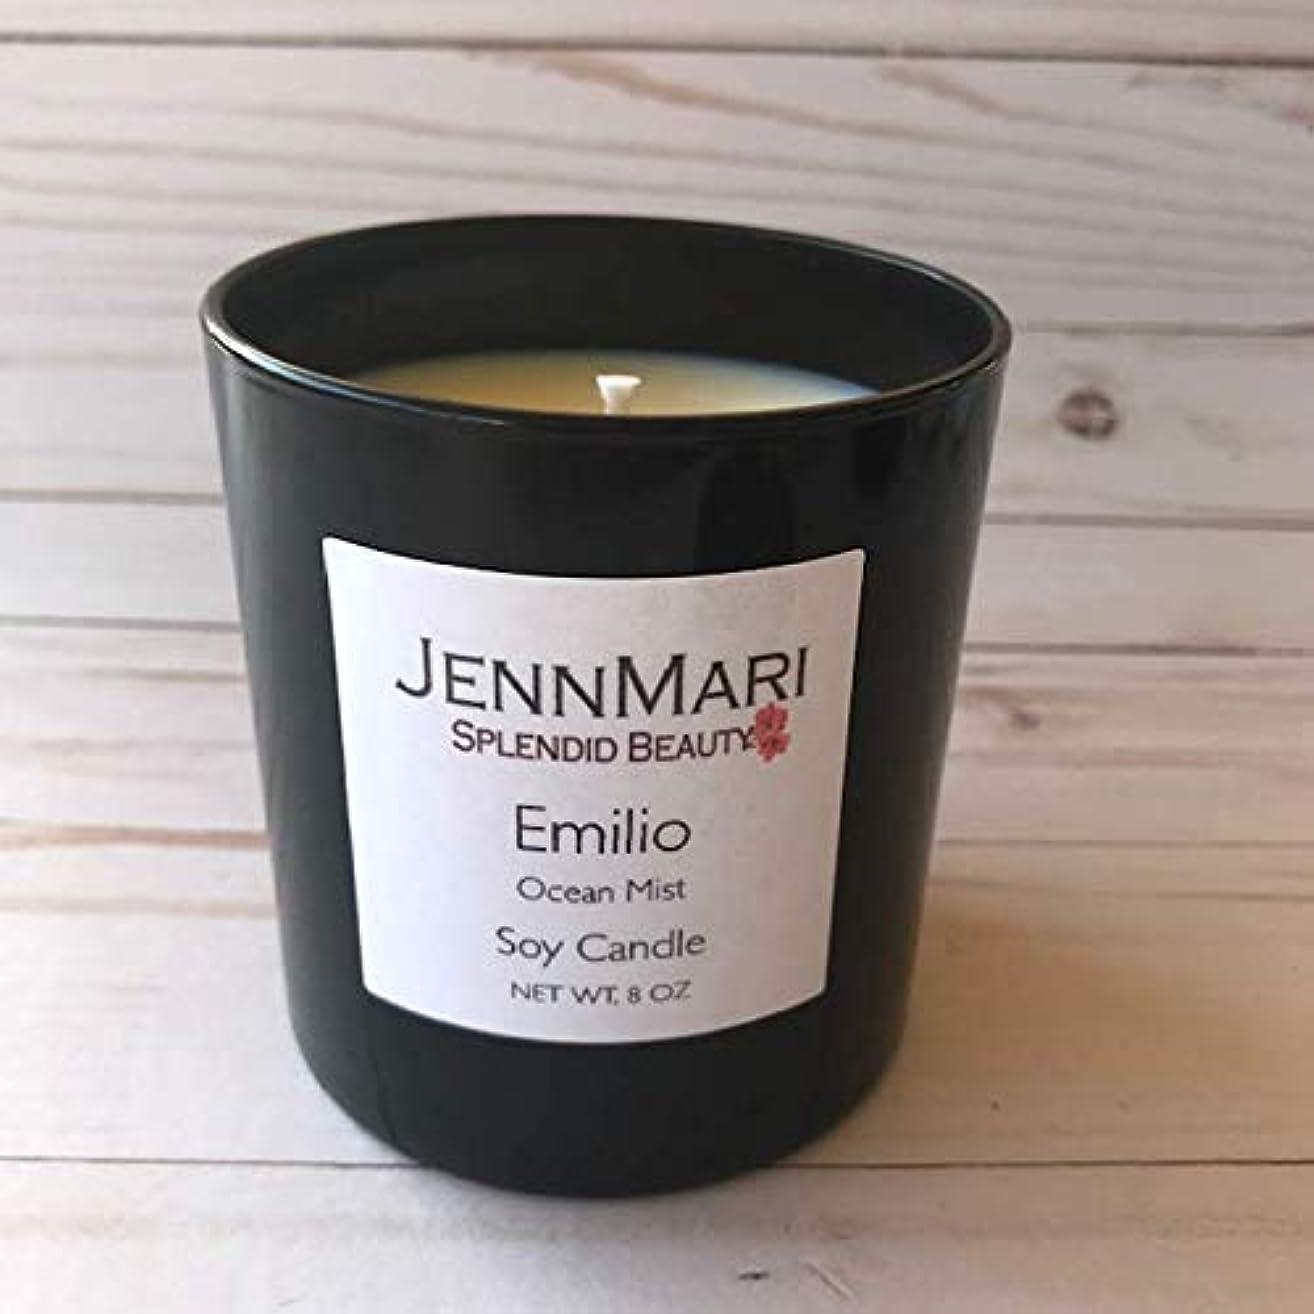 Splendid Beauty   Ocean Mist Scented Soy Candle Glass Jar   10 Oz   Handmade   Eco-friendly   Vegan   Cotton Wick   100% Soy Wax